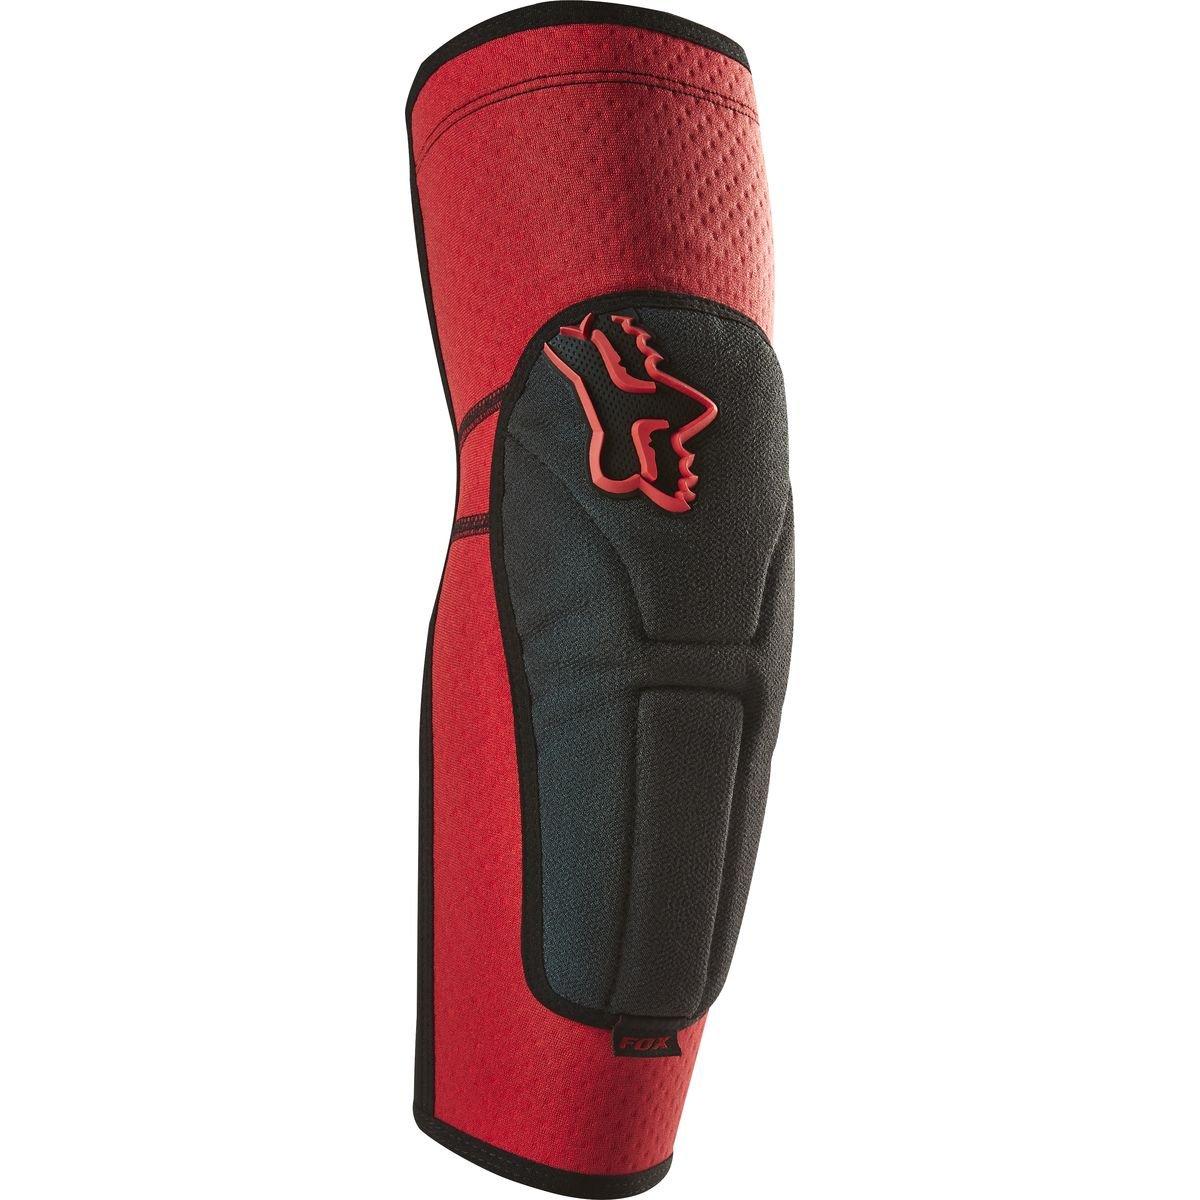 Fox Racing Launch Enduro MTB Cycling Elbow Pad (Red, Small)